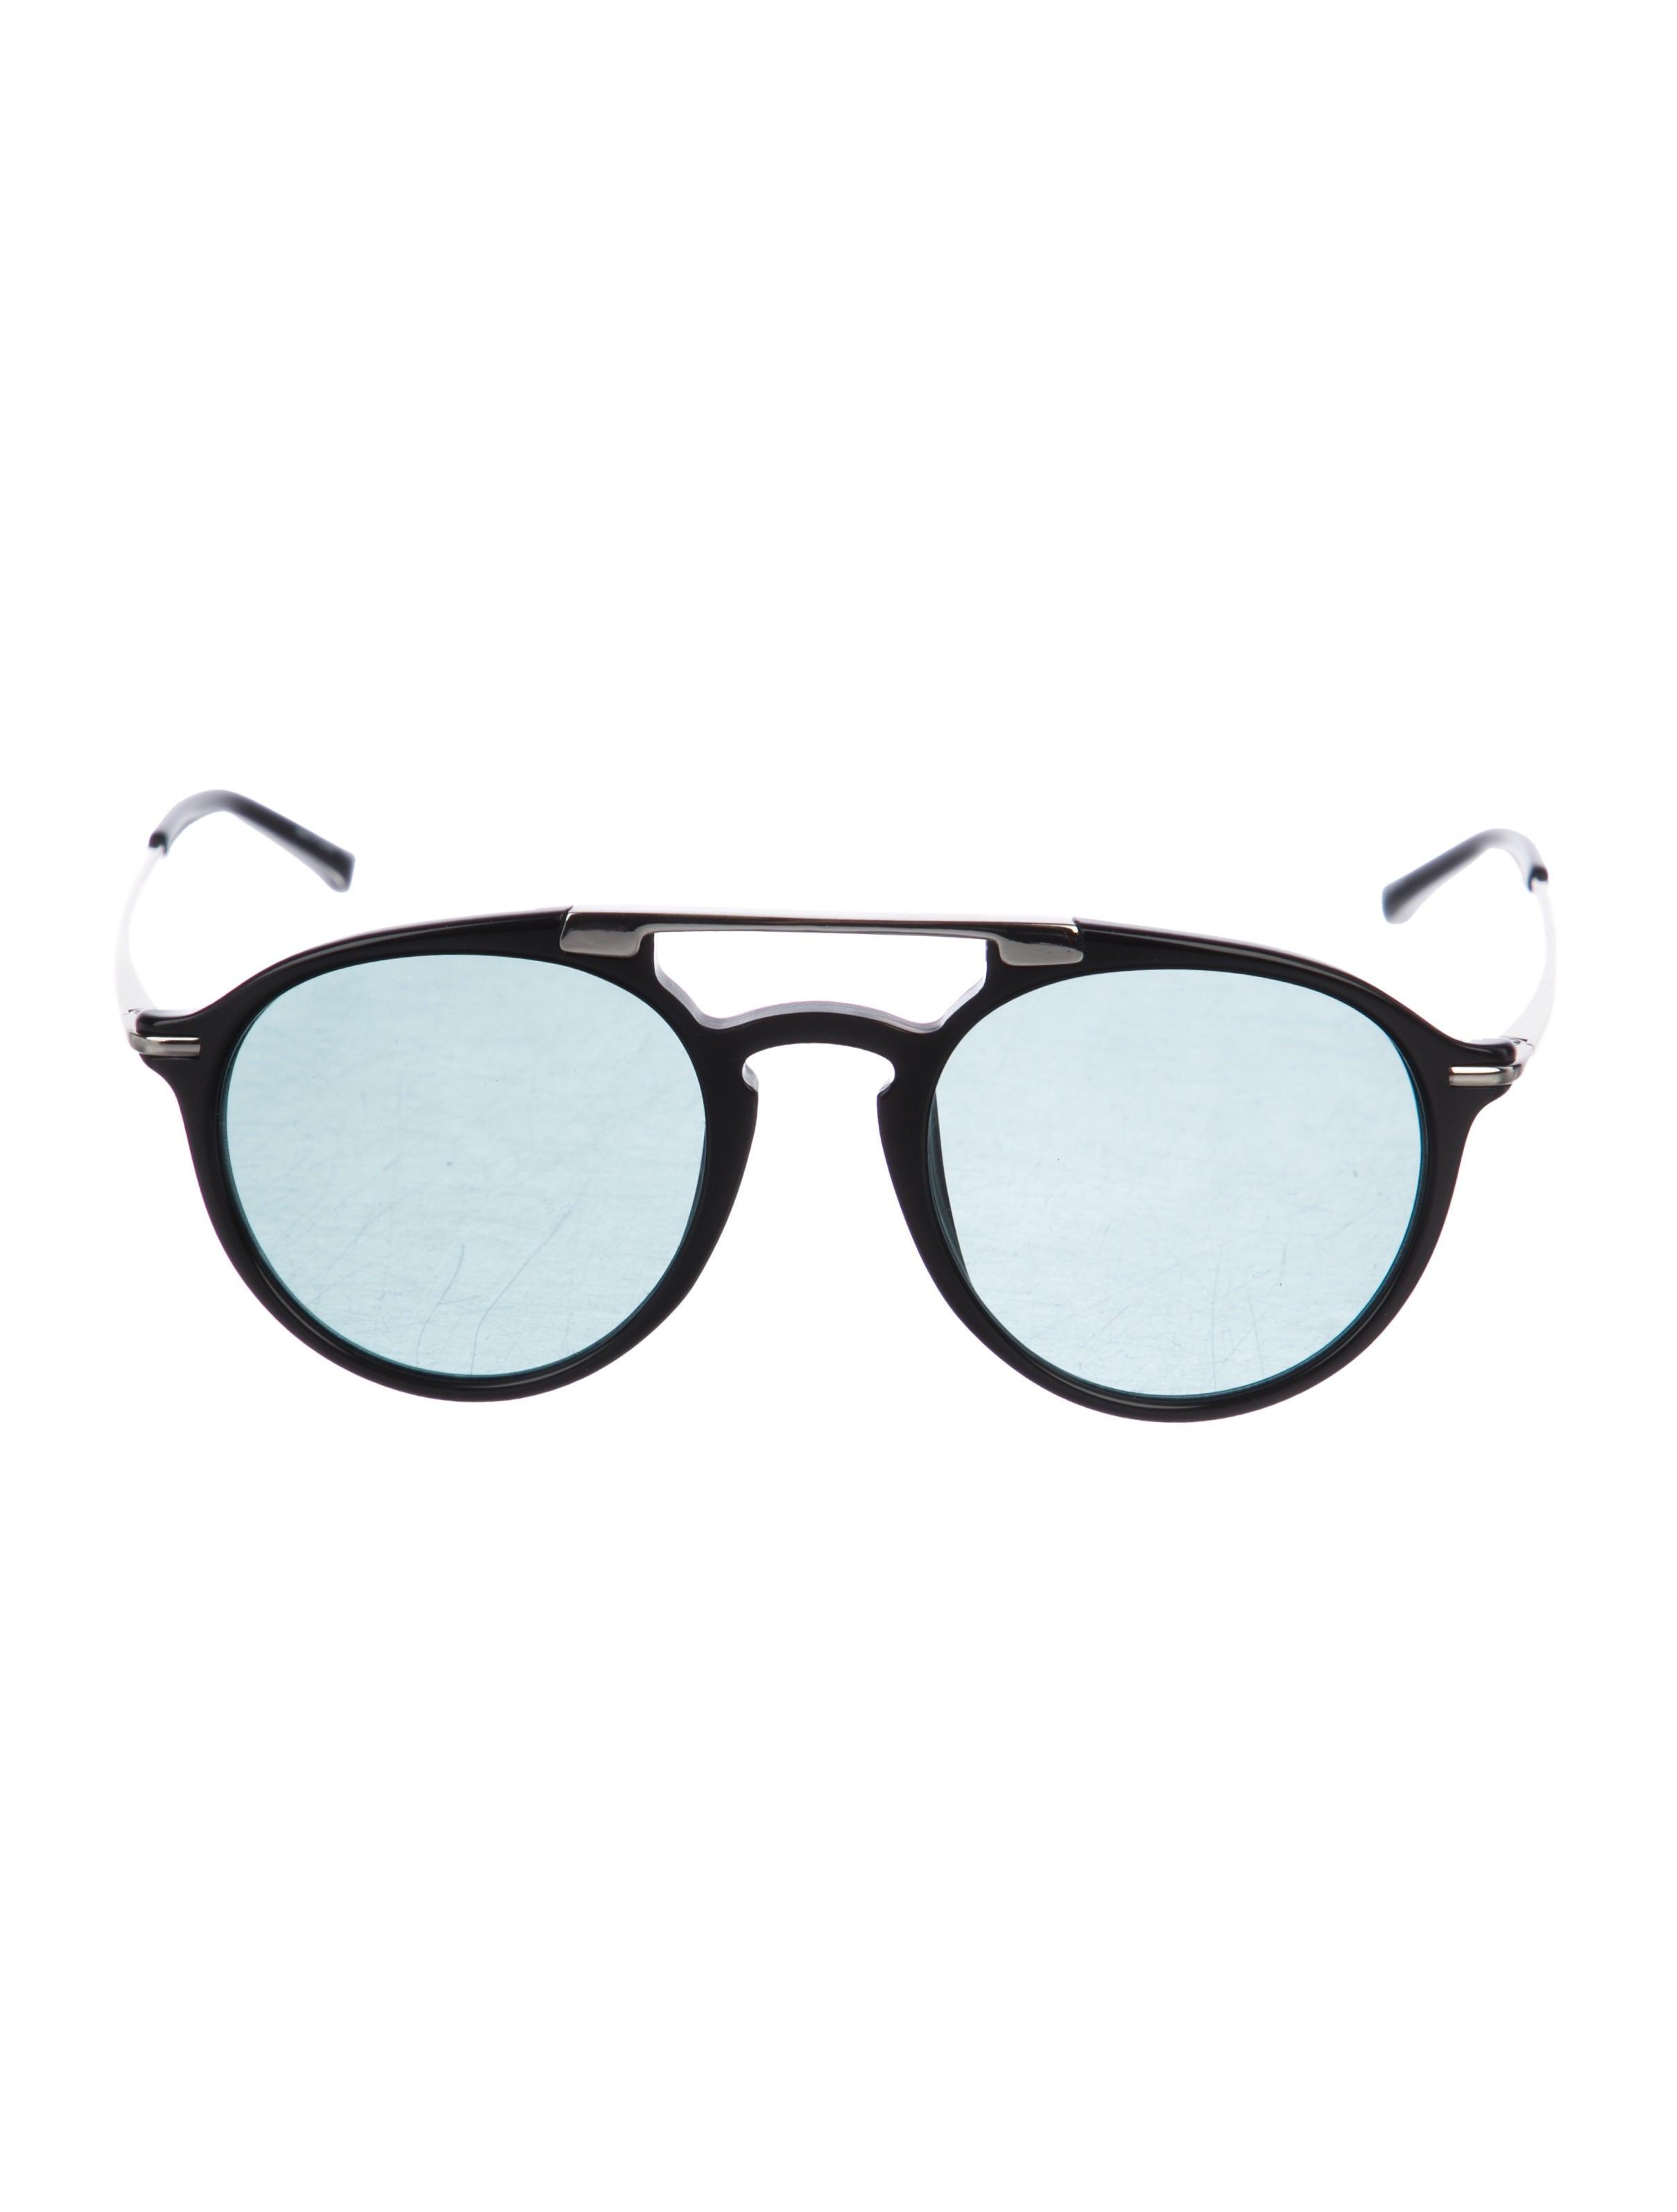 0ffd8af0f87 Linda Farrow x Dries Van Noten Tinted Round Sunglasses - Accessories ...